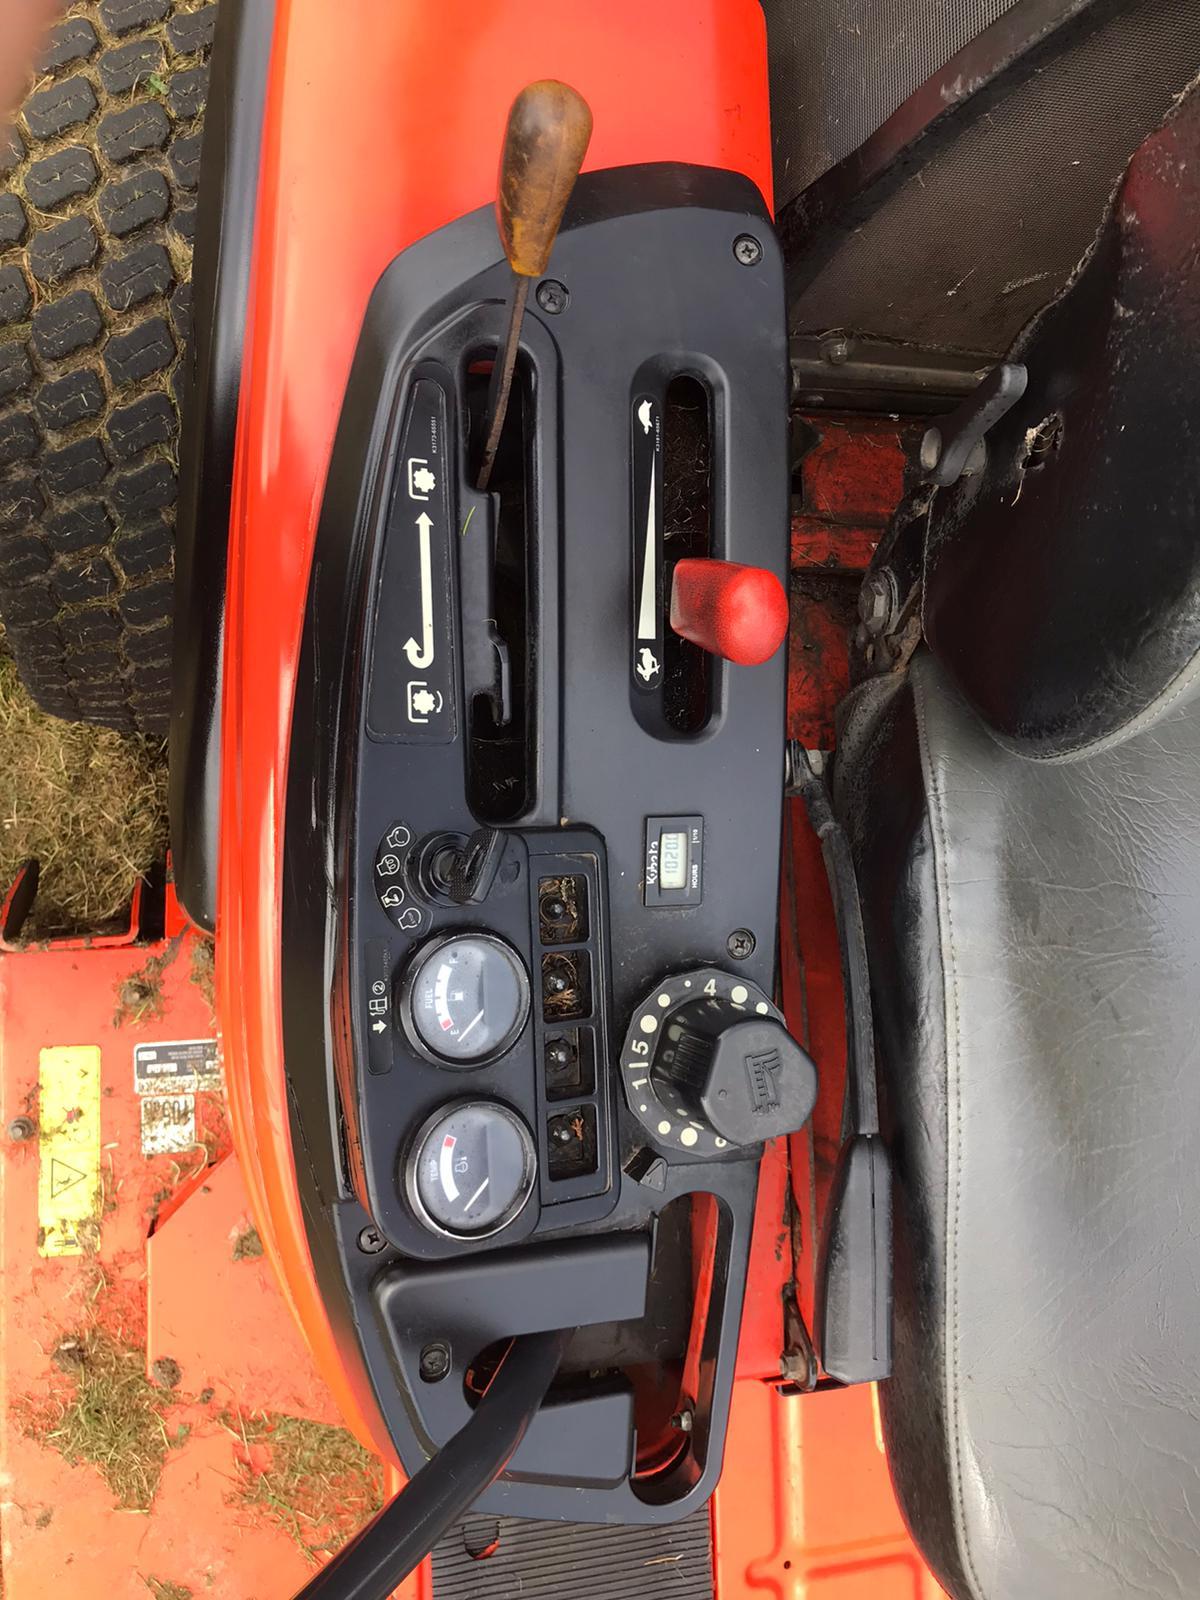 2013 KUBOTA ZD326 ZERO TURN RIDE ON LAWN MOWER, RUNS, DRIVES AND CUTS, 1020 HOURS *PLUS VAT* - Image 5 of 6